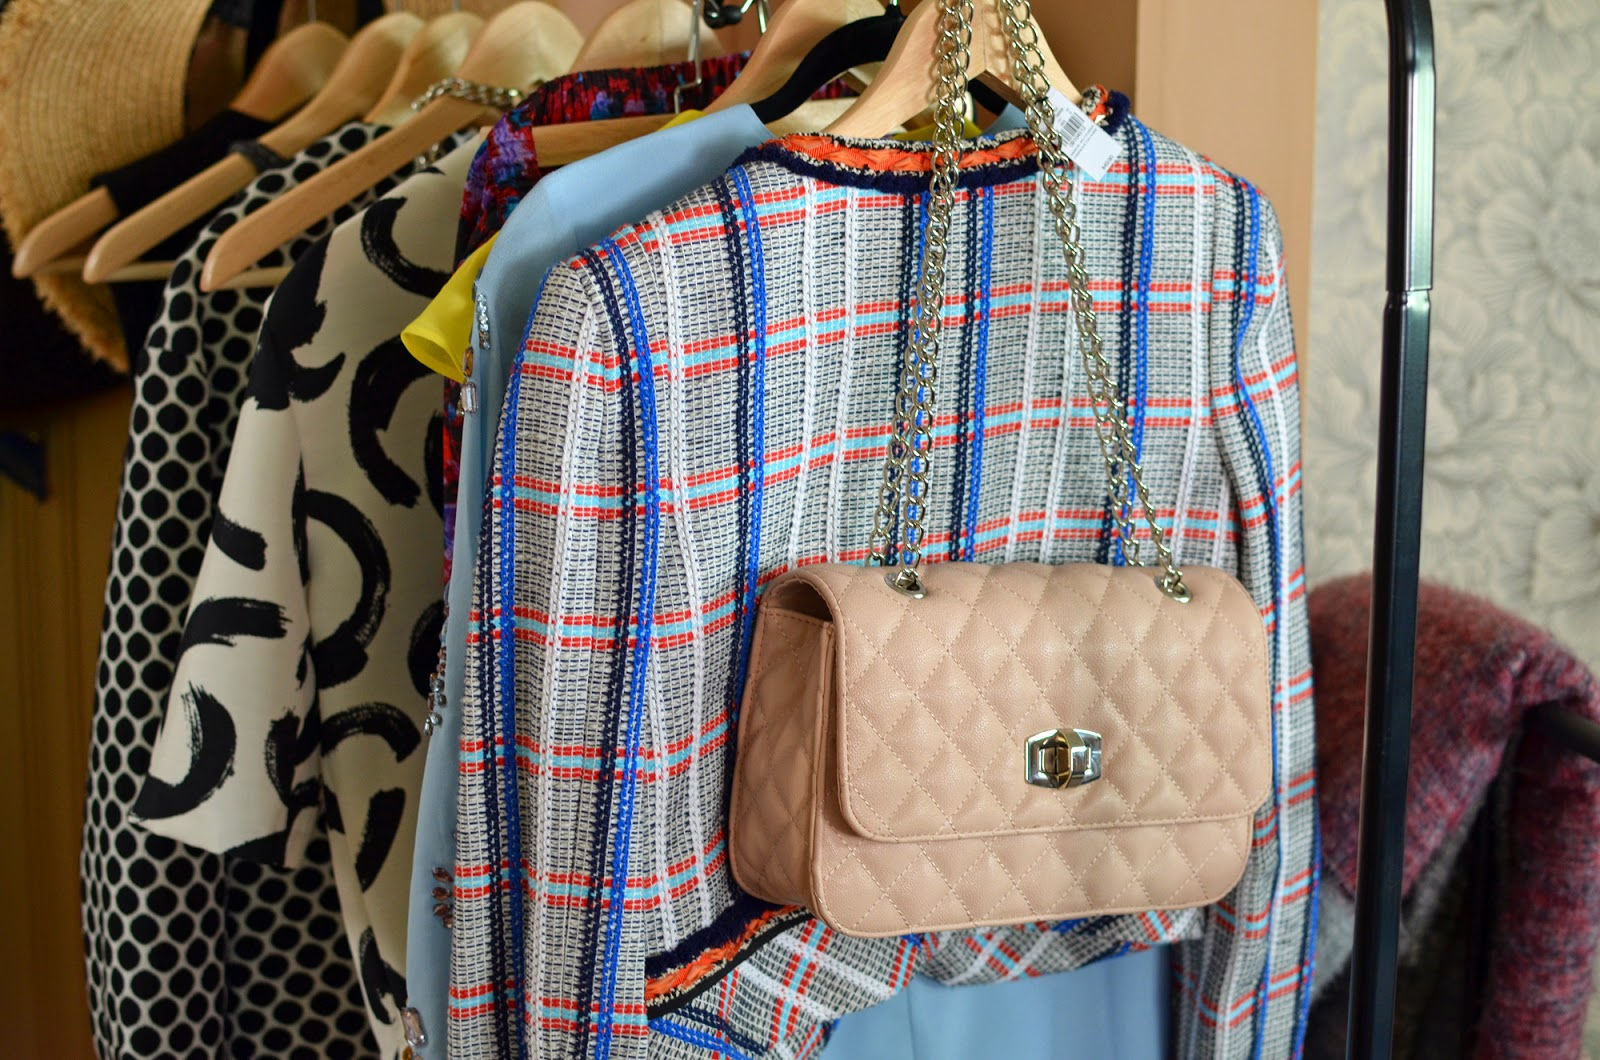 Express handbag chanel quilted chain strap shoulder bag haul fashion